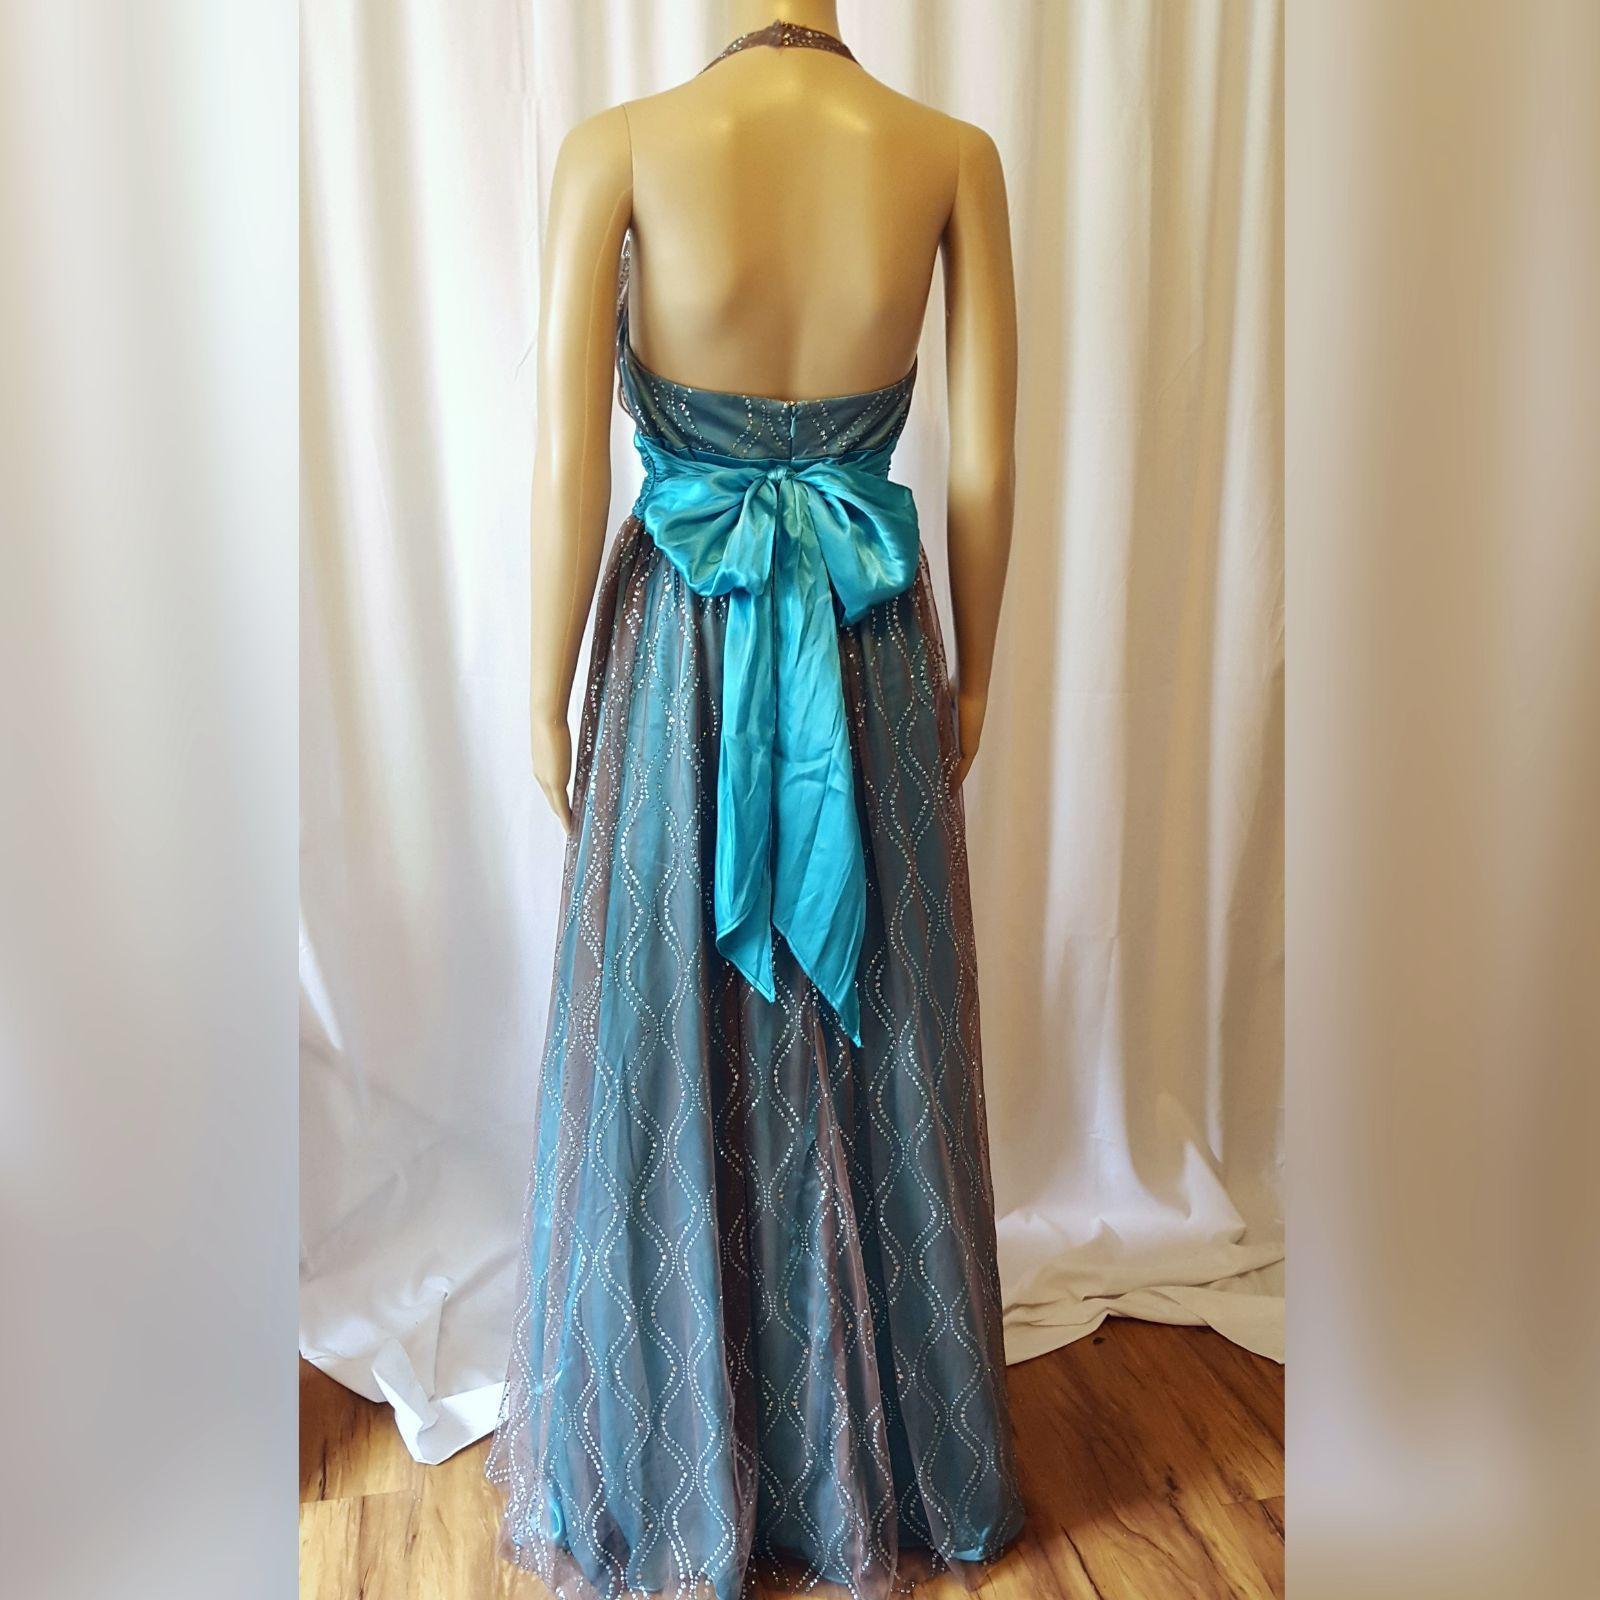 Fine Prom Dresses In Smithfield Nc Illustration - Princess Wedding ...